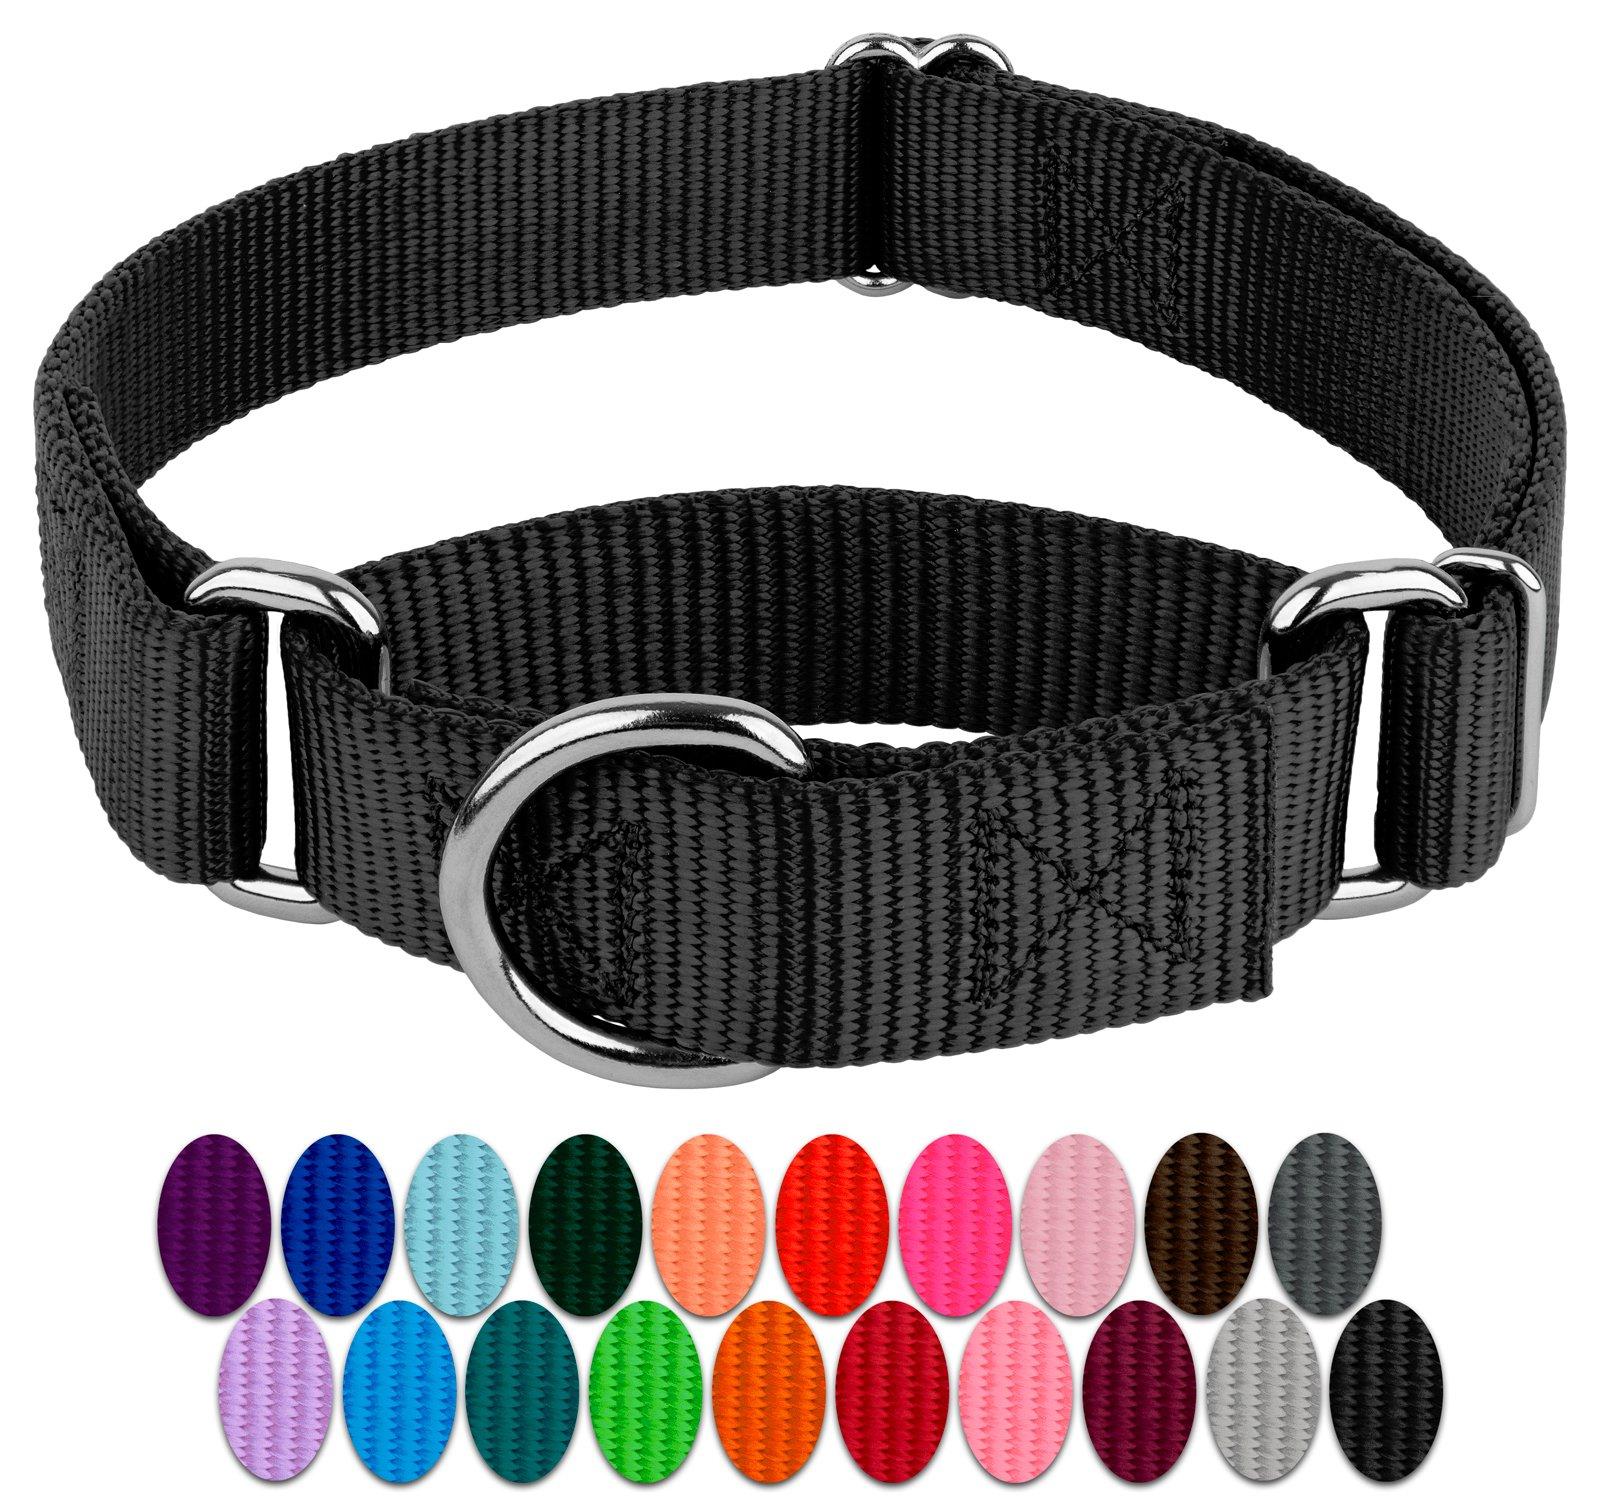 Indestructible Dog Collar: Amazon.com